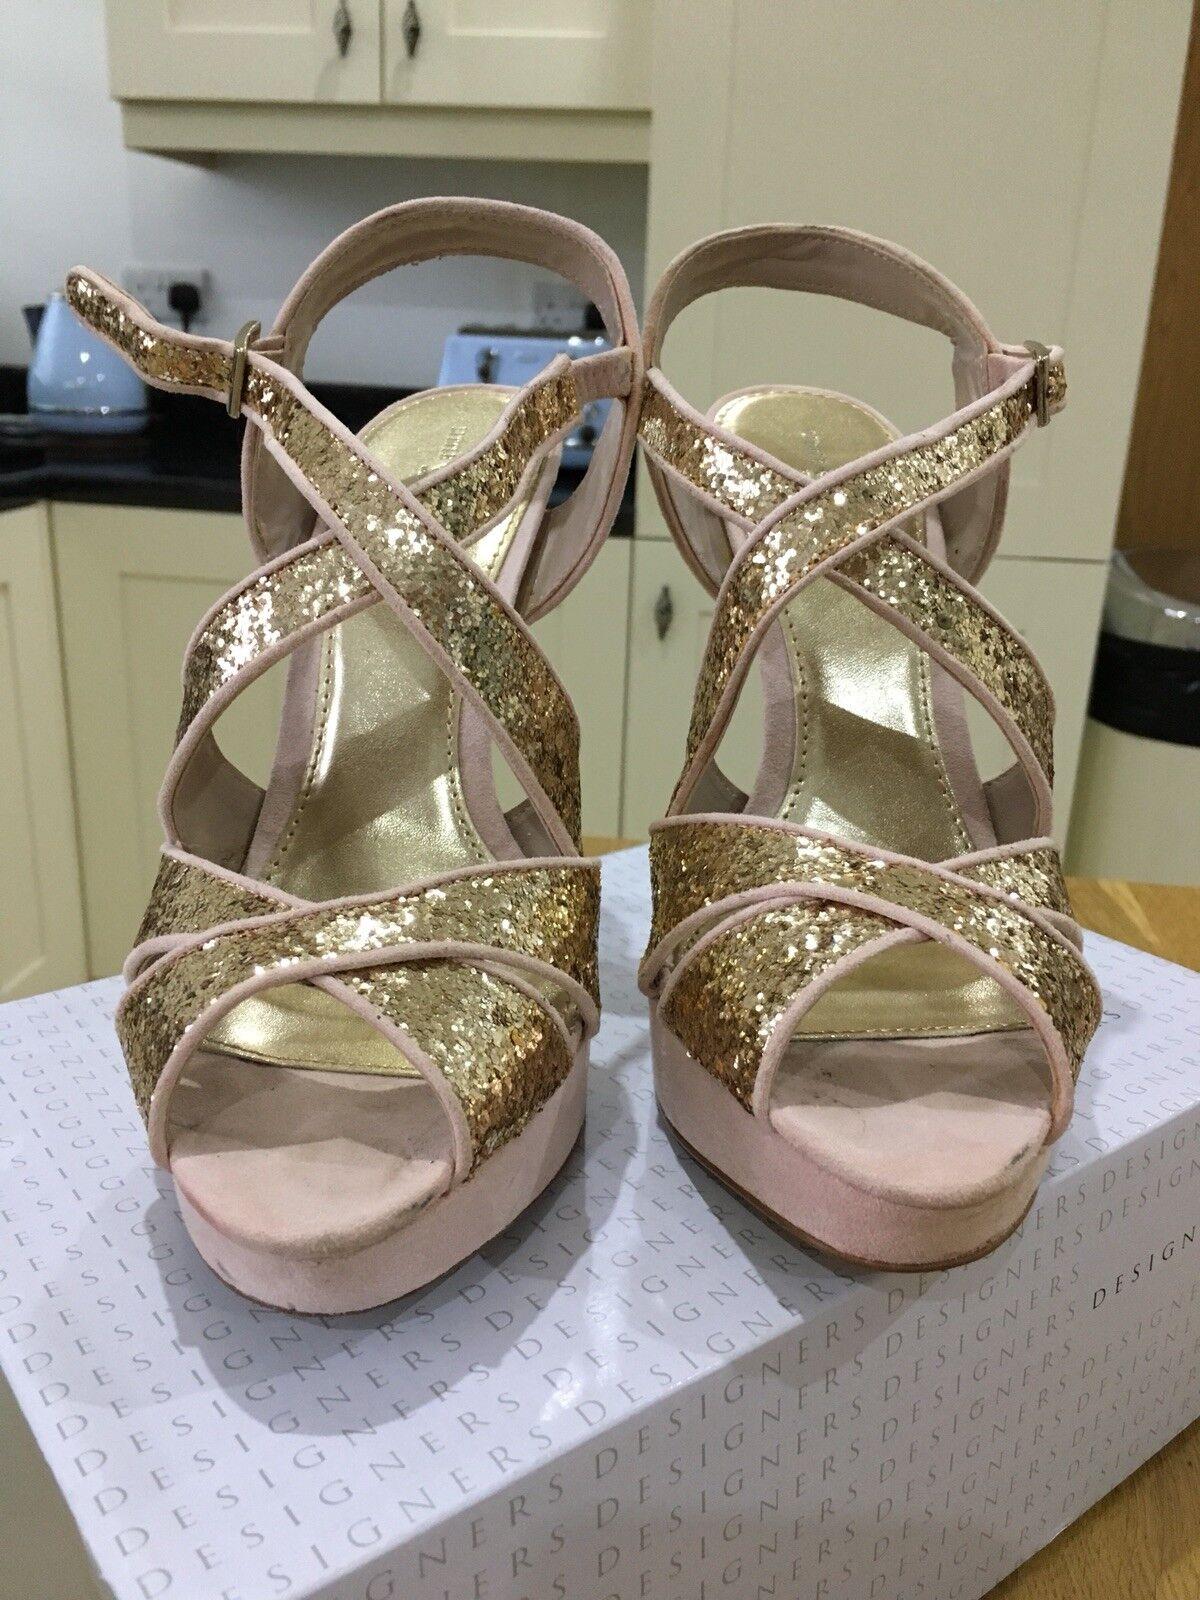 Men's/Women's Little Mistress Crazy Nude Sandals Size 5 Crazy Mistress price modern Excellent function 67cd5f